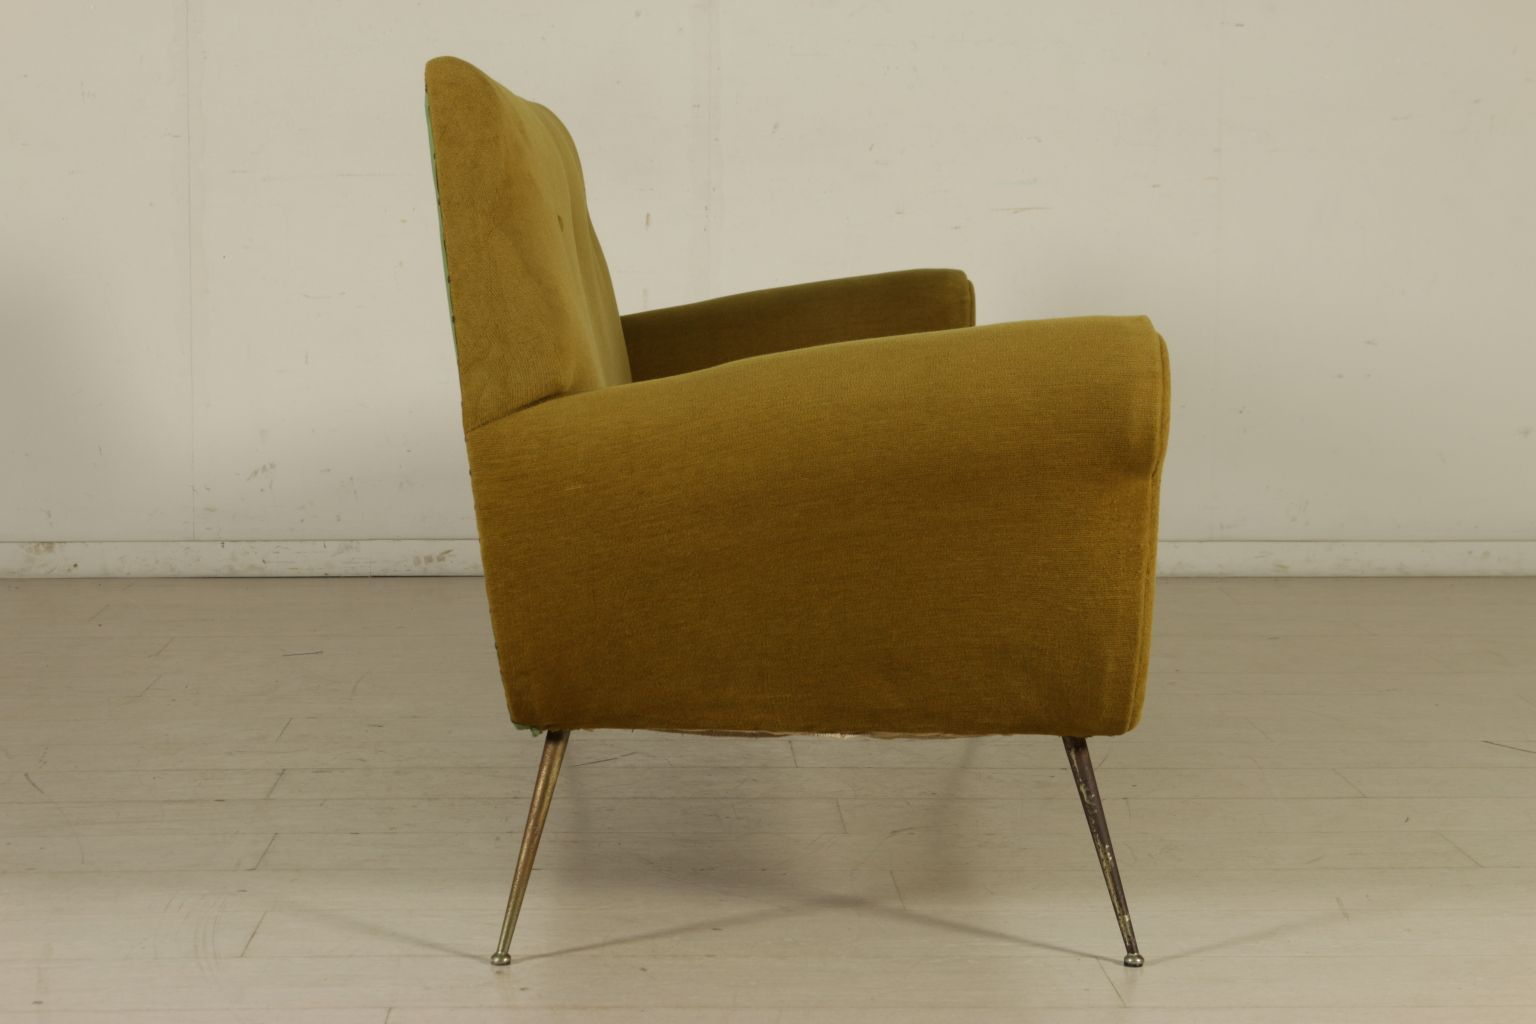 vintage sofa aus schaumstoff gewebe vermessingtem metall bei pamono kaufen. Black Bedroom Furniture Sets. Home Design Ideas